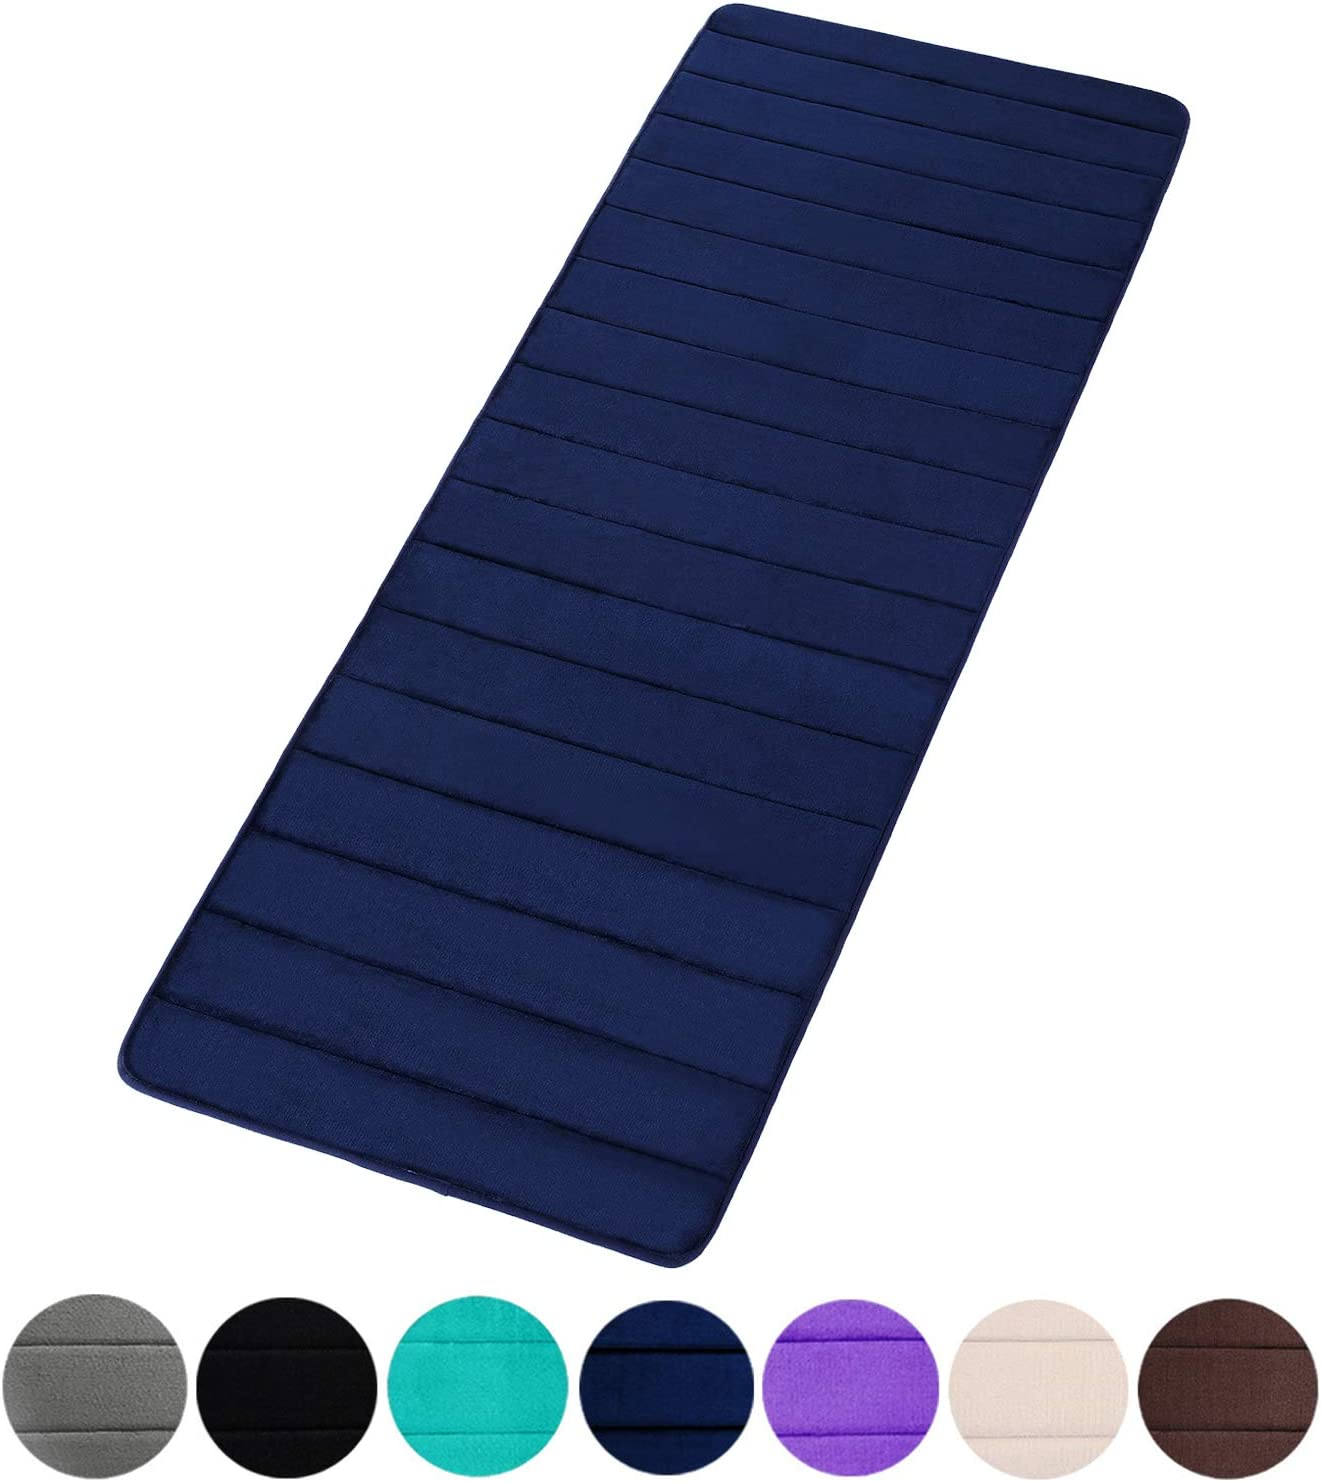 "Buganda Memory Foam Soft Bath Mats - Non Slip Absorbent Bathroom Rugs Extra Large Size Runner Long Mat for Kitchen Bathroom Floors 24""x70"", Navy Blue"